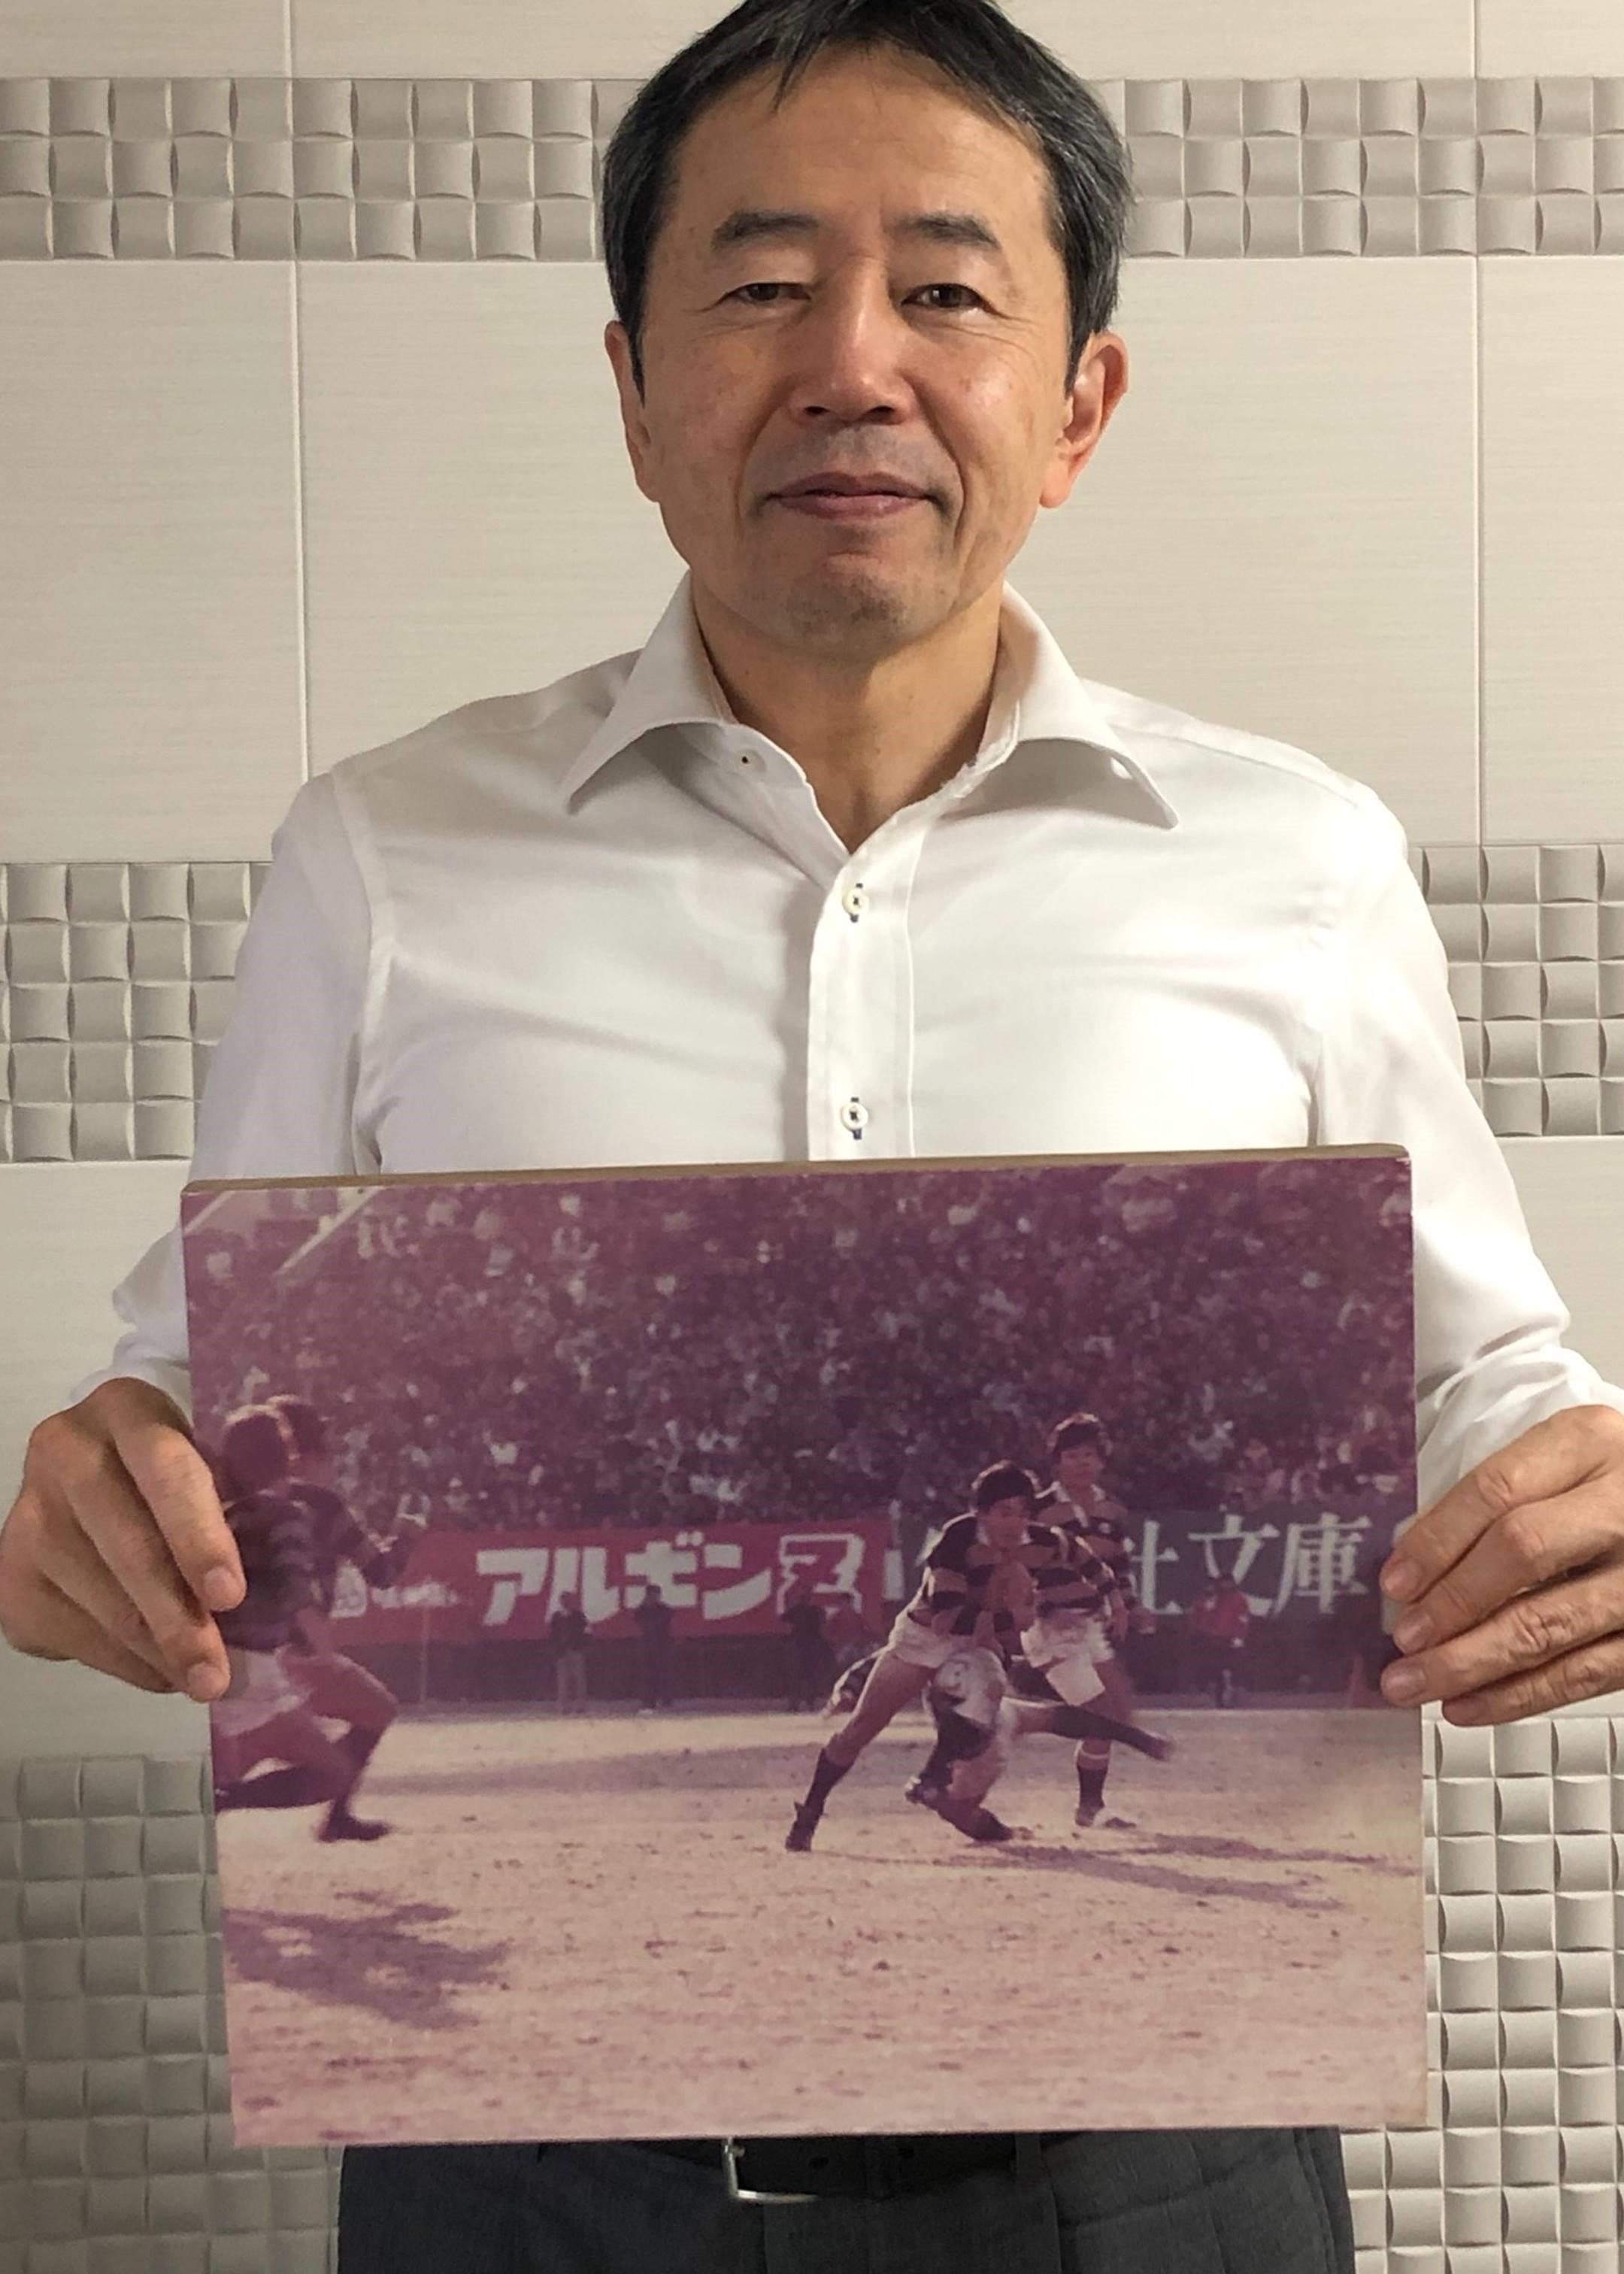 【公式】実使用「慶応ラグビー歴戦の記念品②」 松永 敏宏